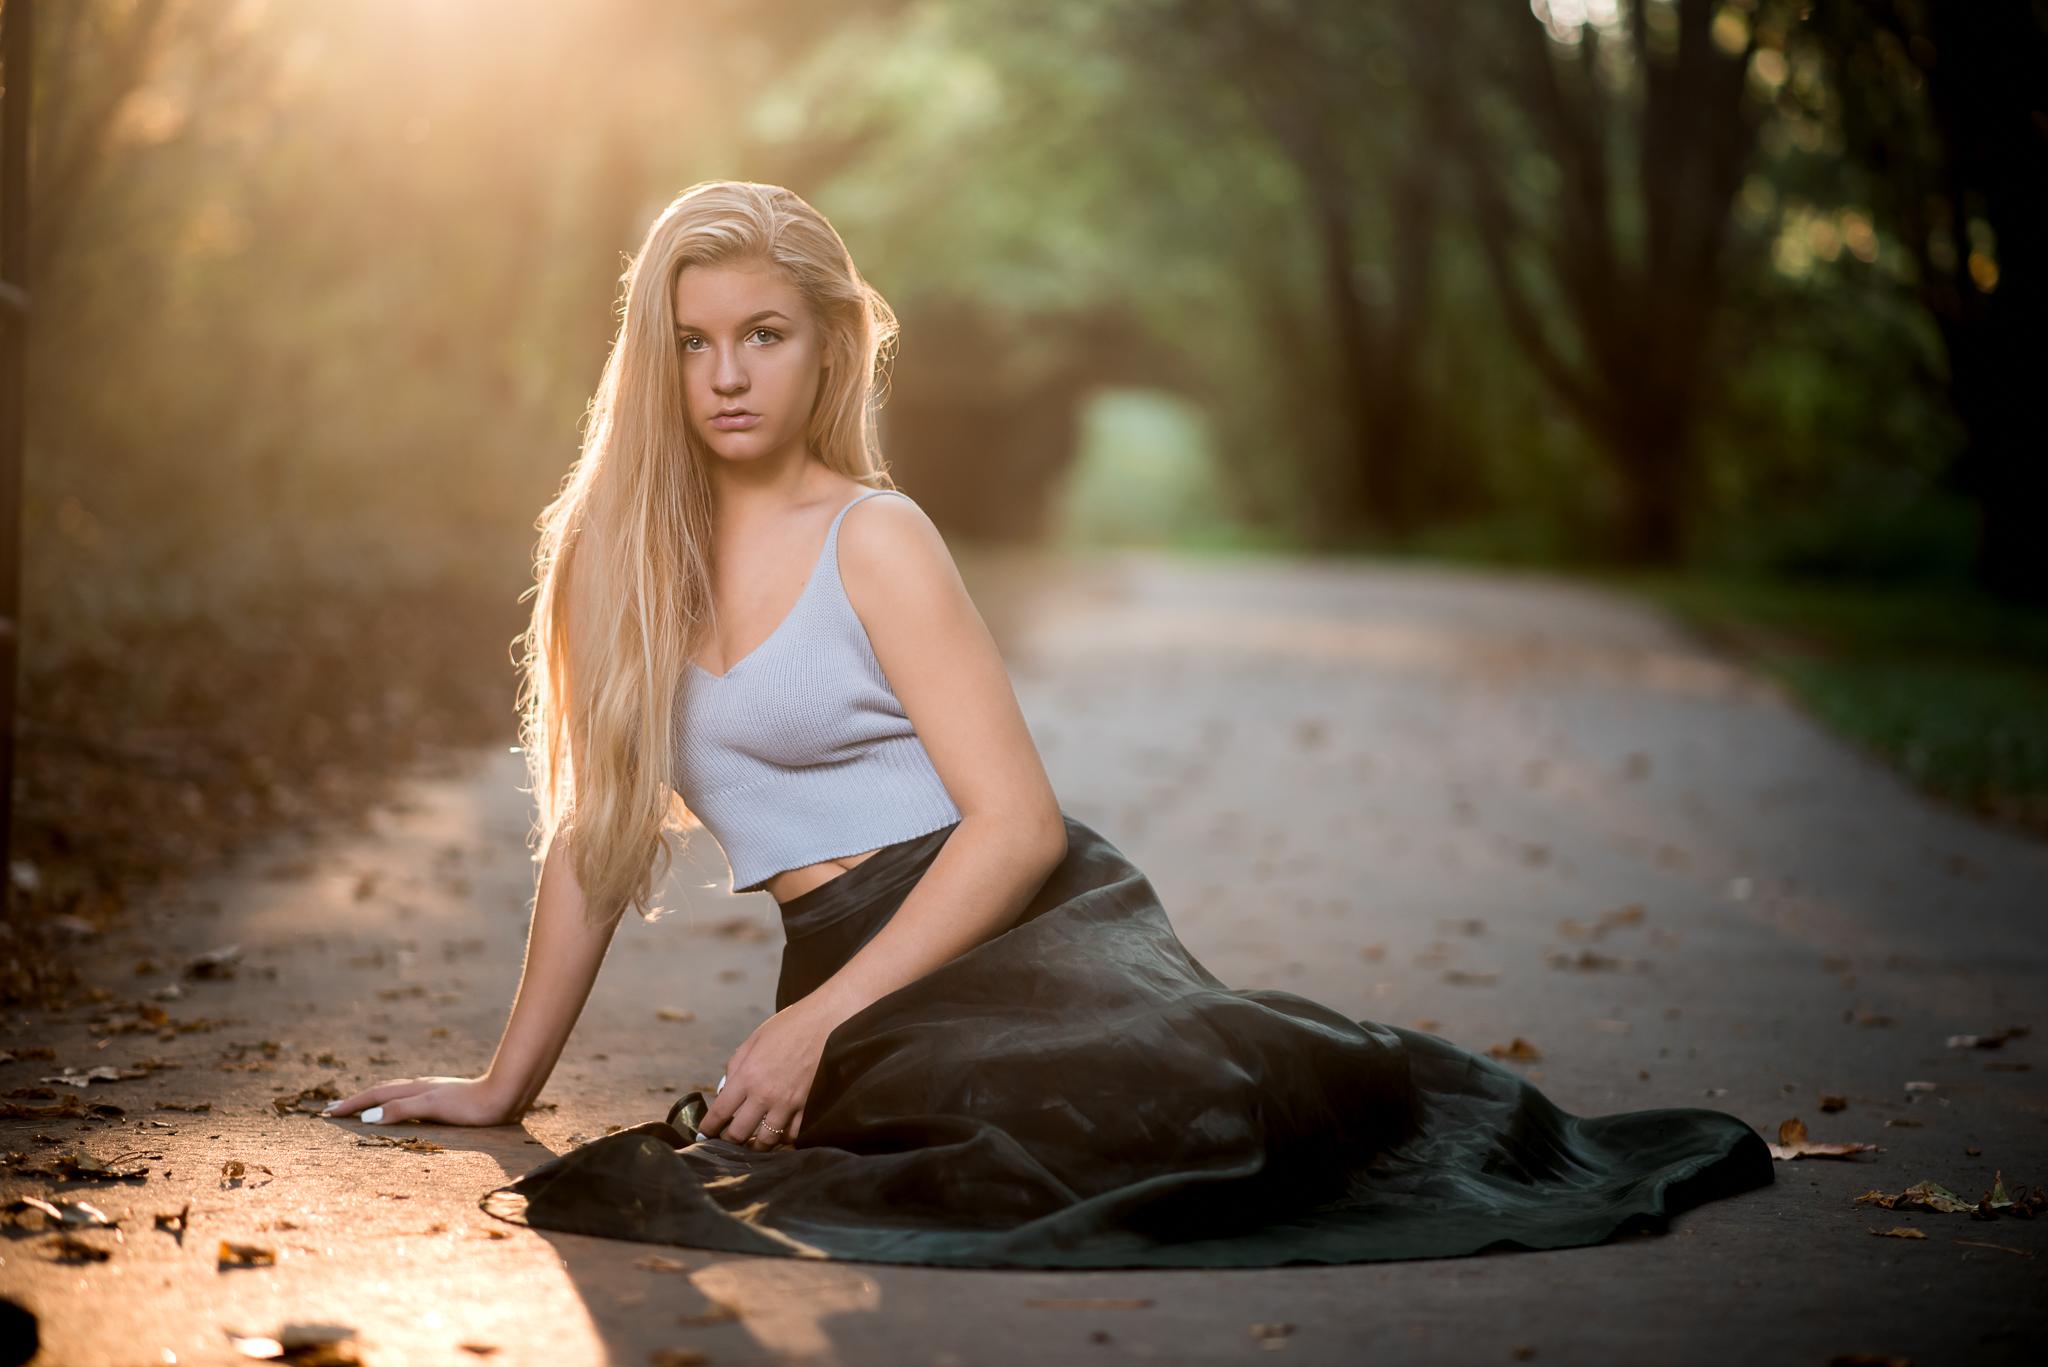 Charlotte High School Senior Photographer North Carolina Portraits Commercial License Professional Photography